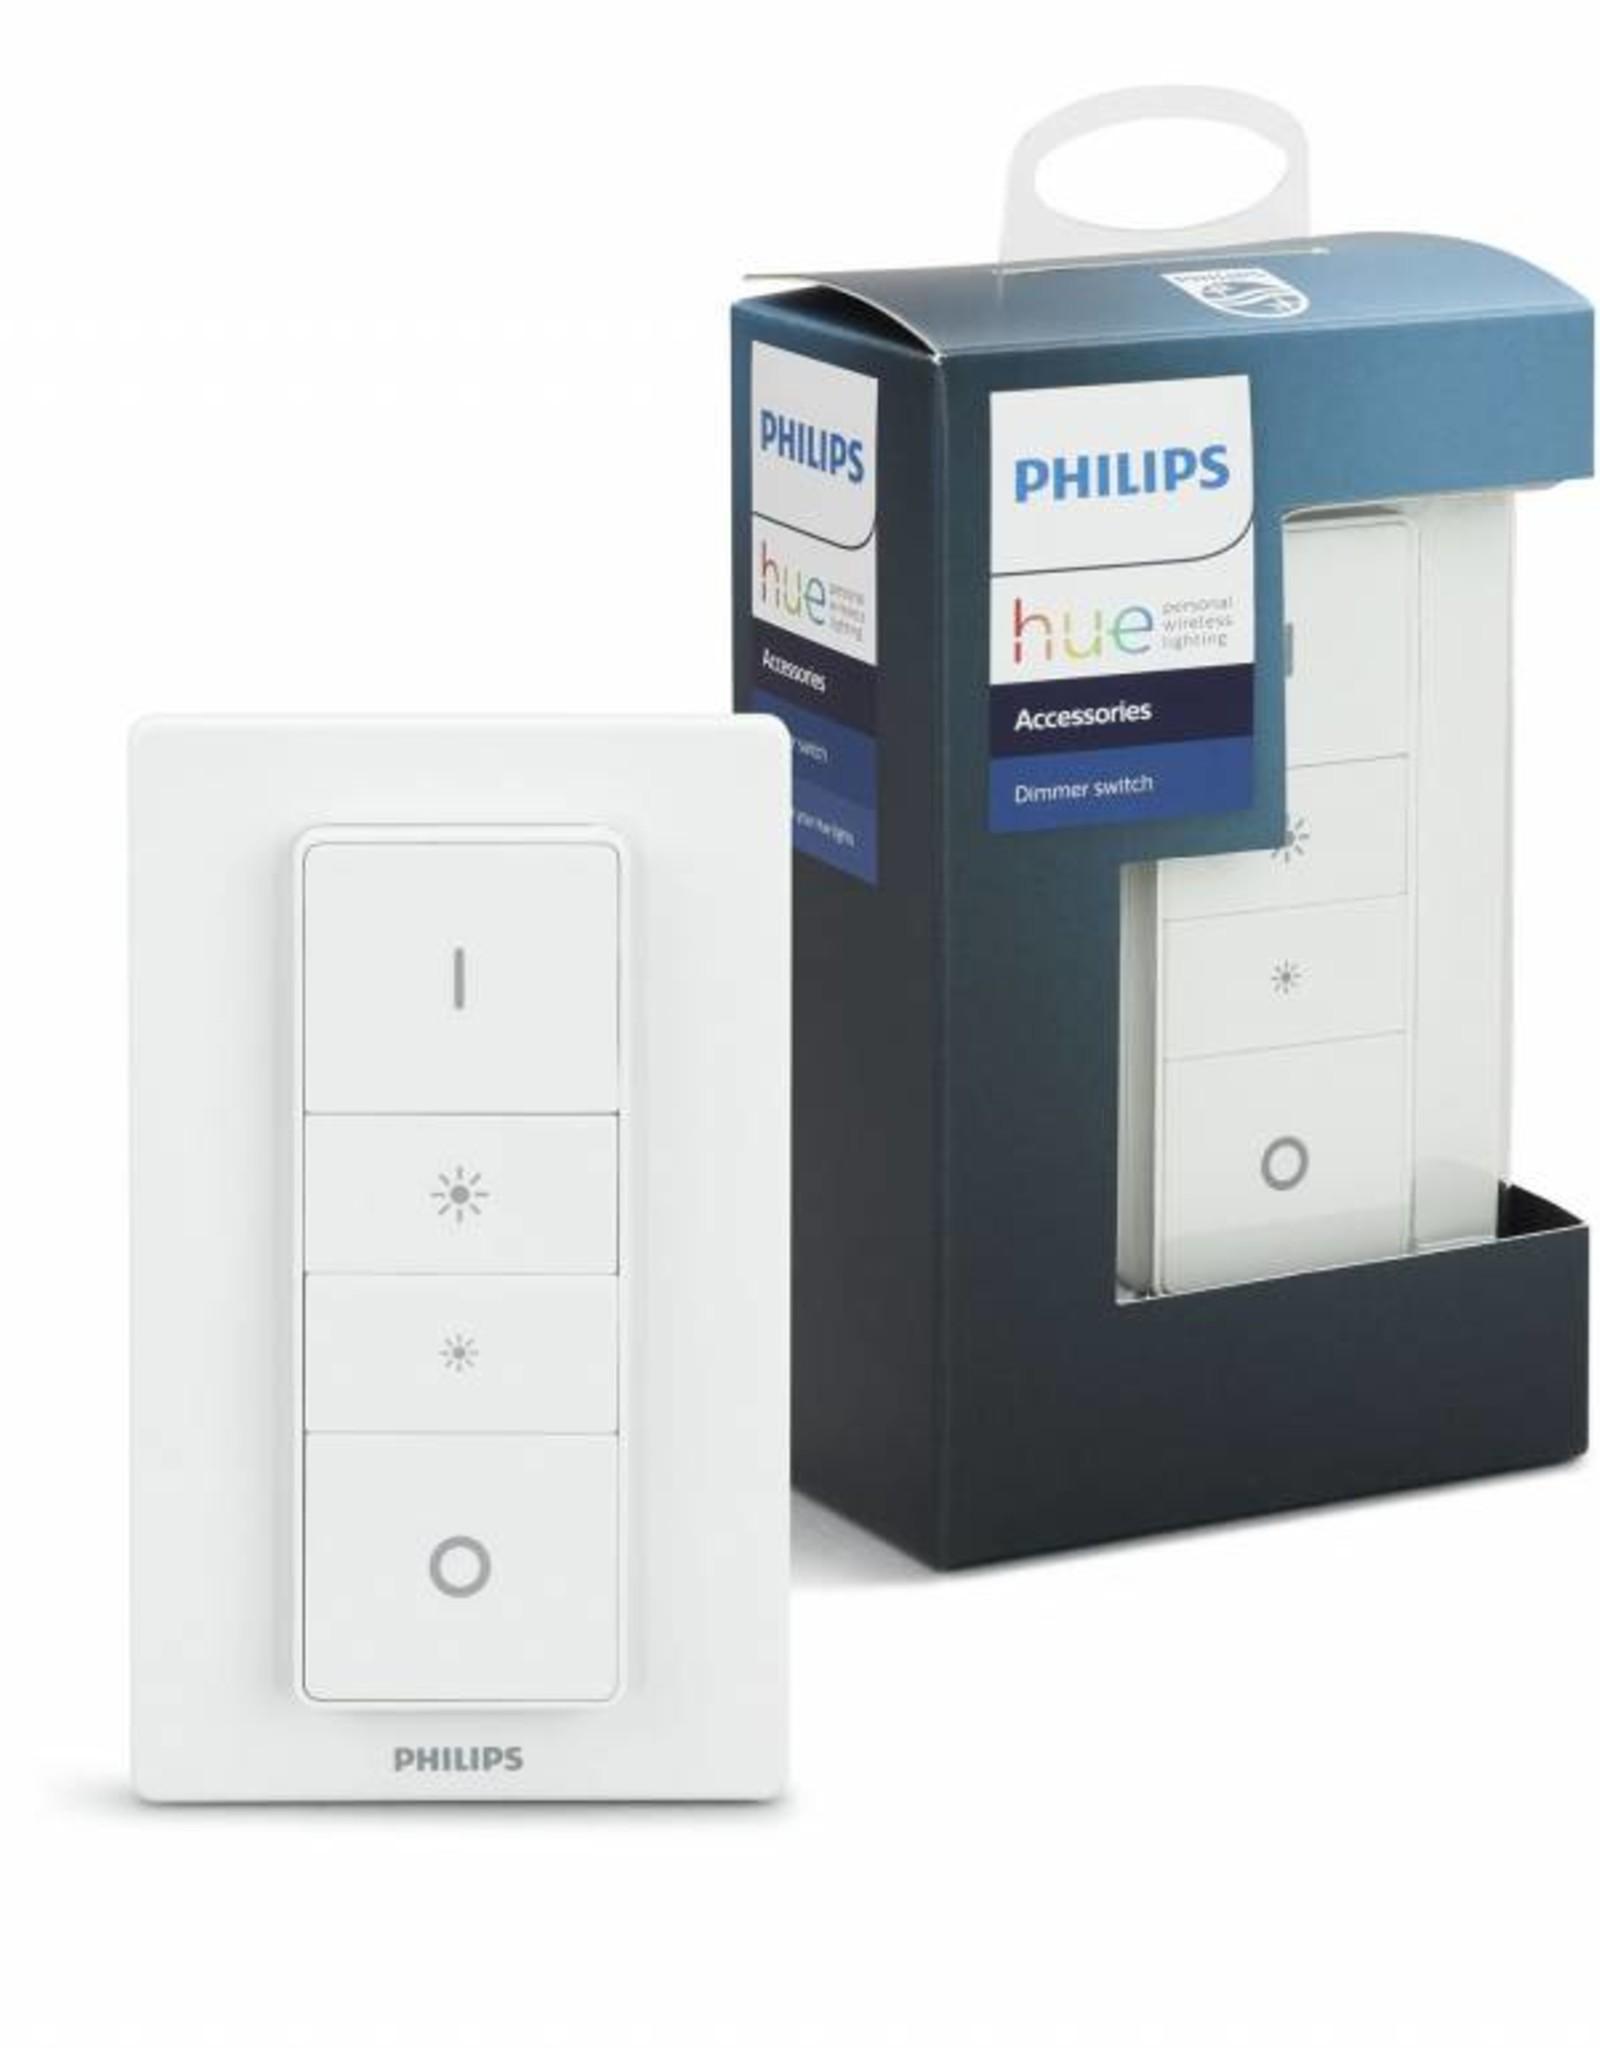 Philips Hue Dimmer